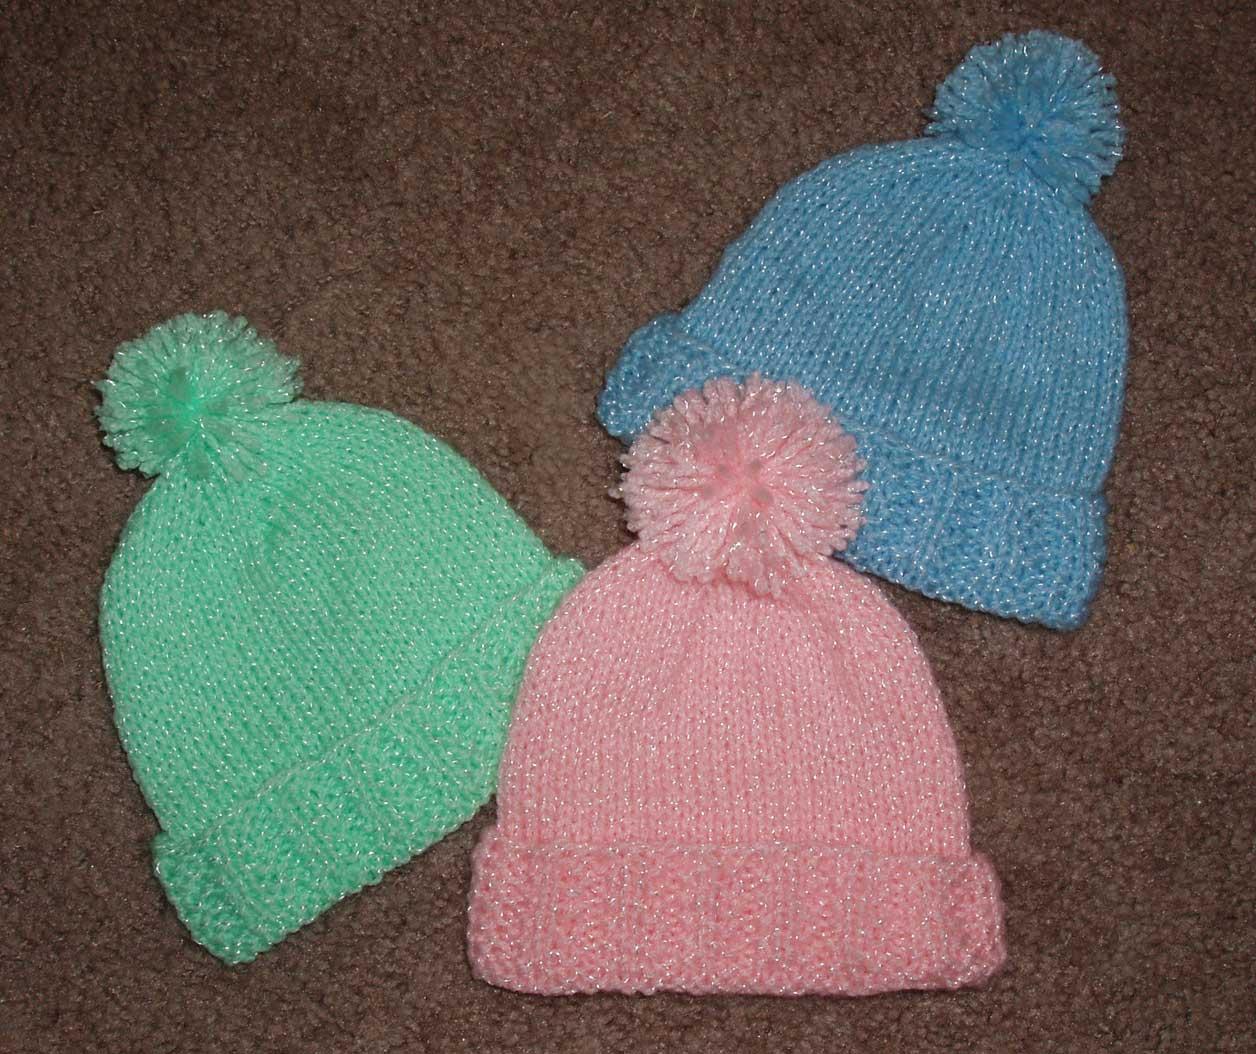 Knit Rib Stitch Hat : Baby Hat in Mistake-Stitch Rib